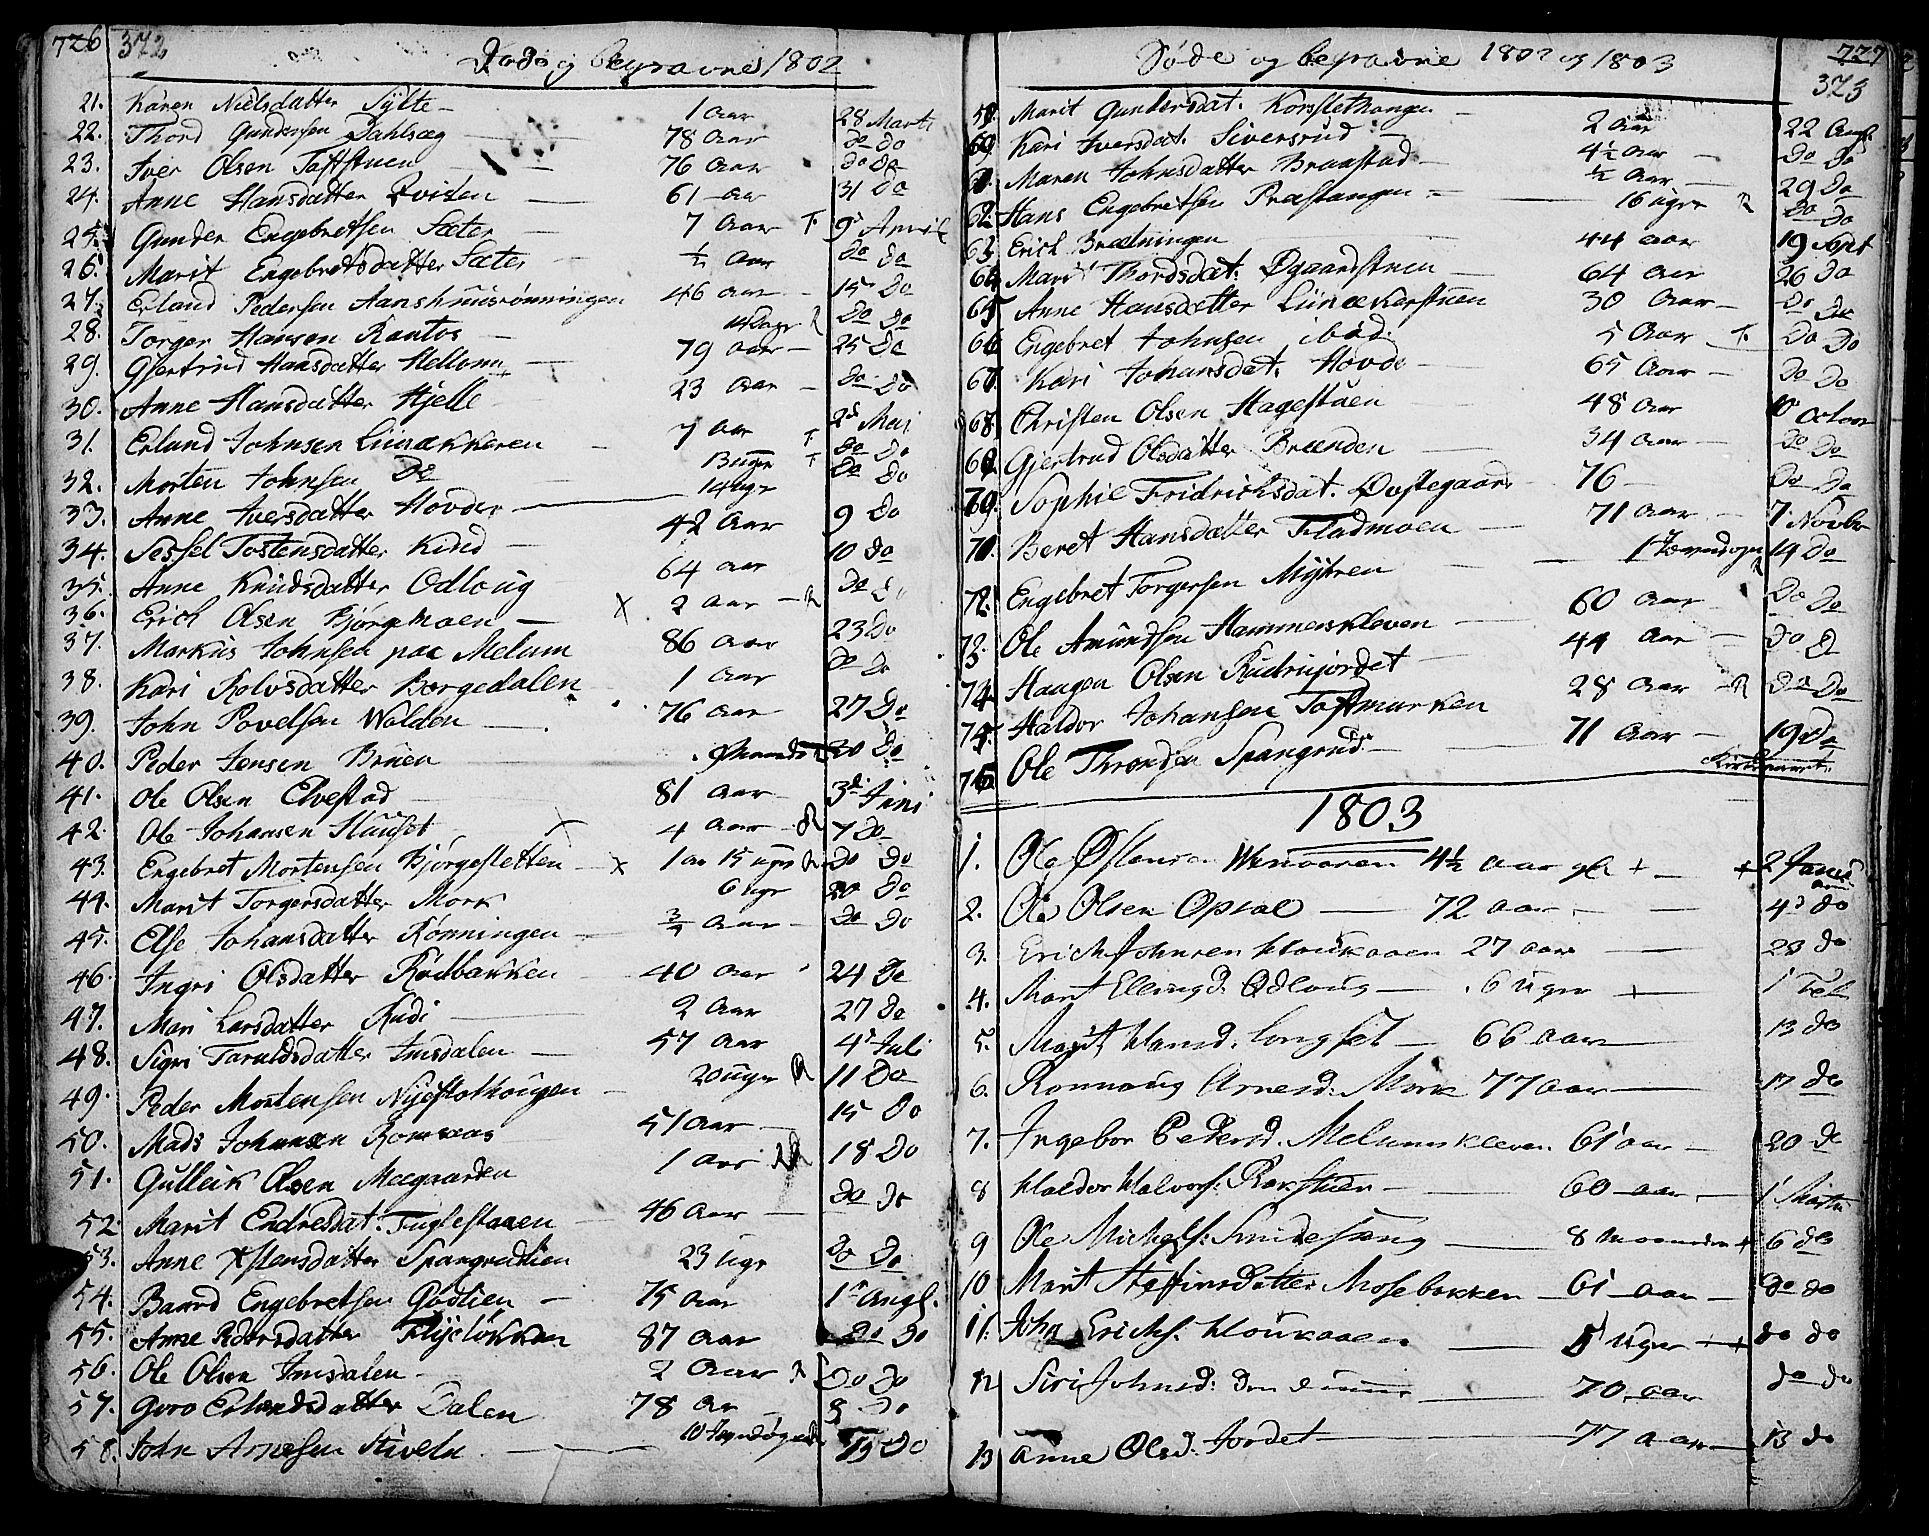 SAH, Ringebu prestekontor, Ministerialbok nr. 3, 1781-1820, s. 372-373